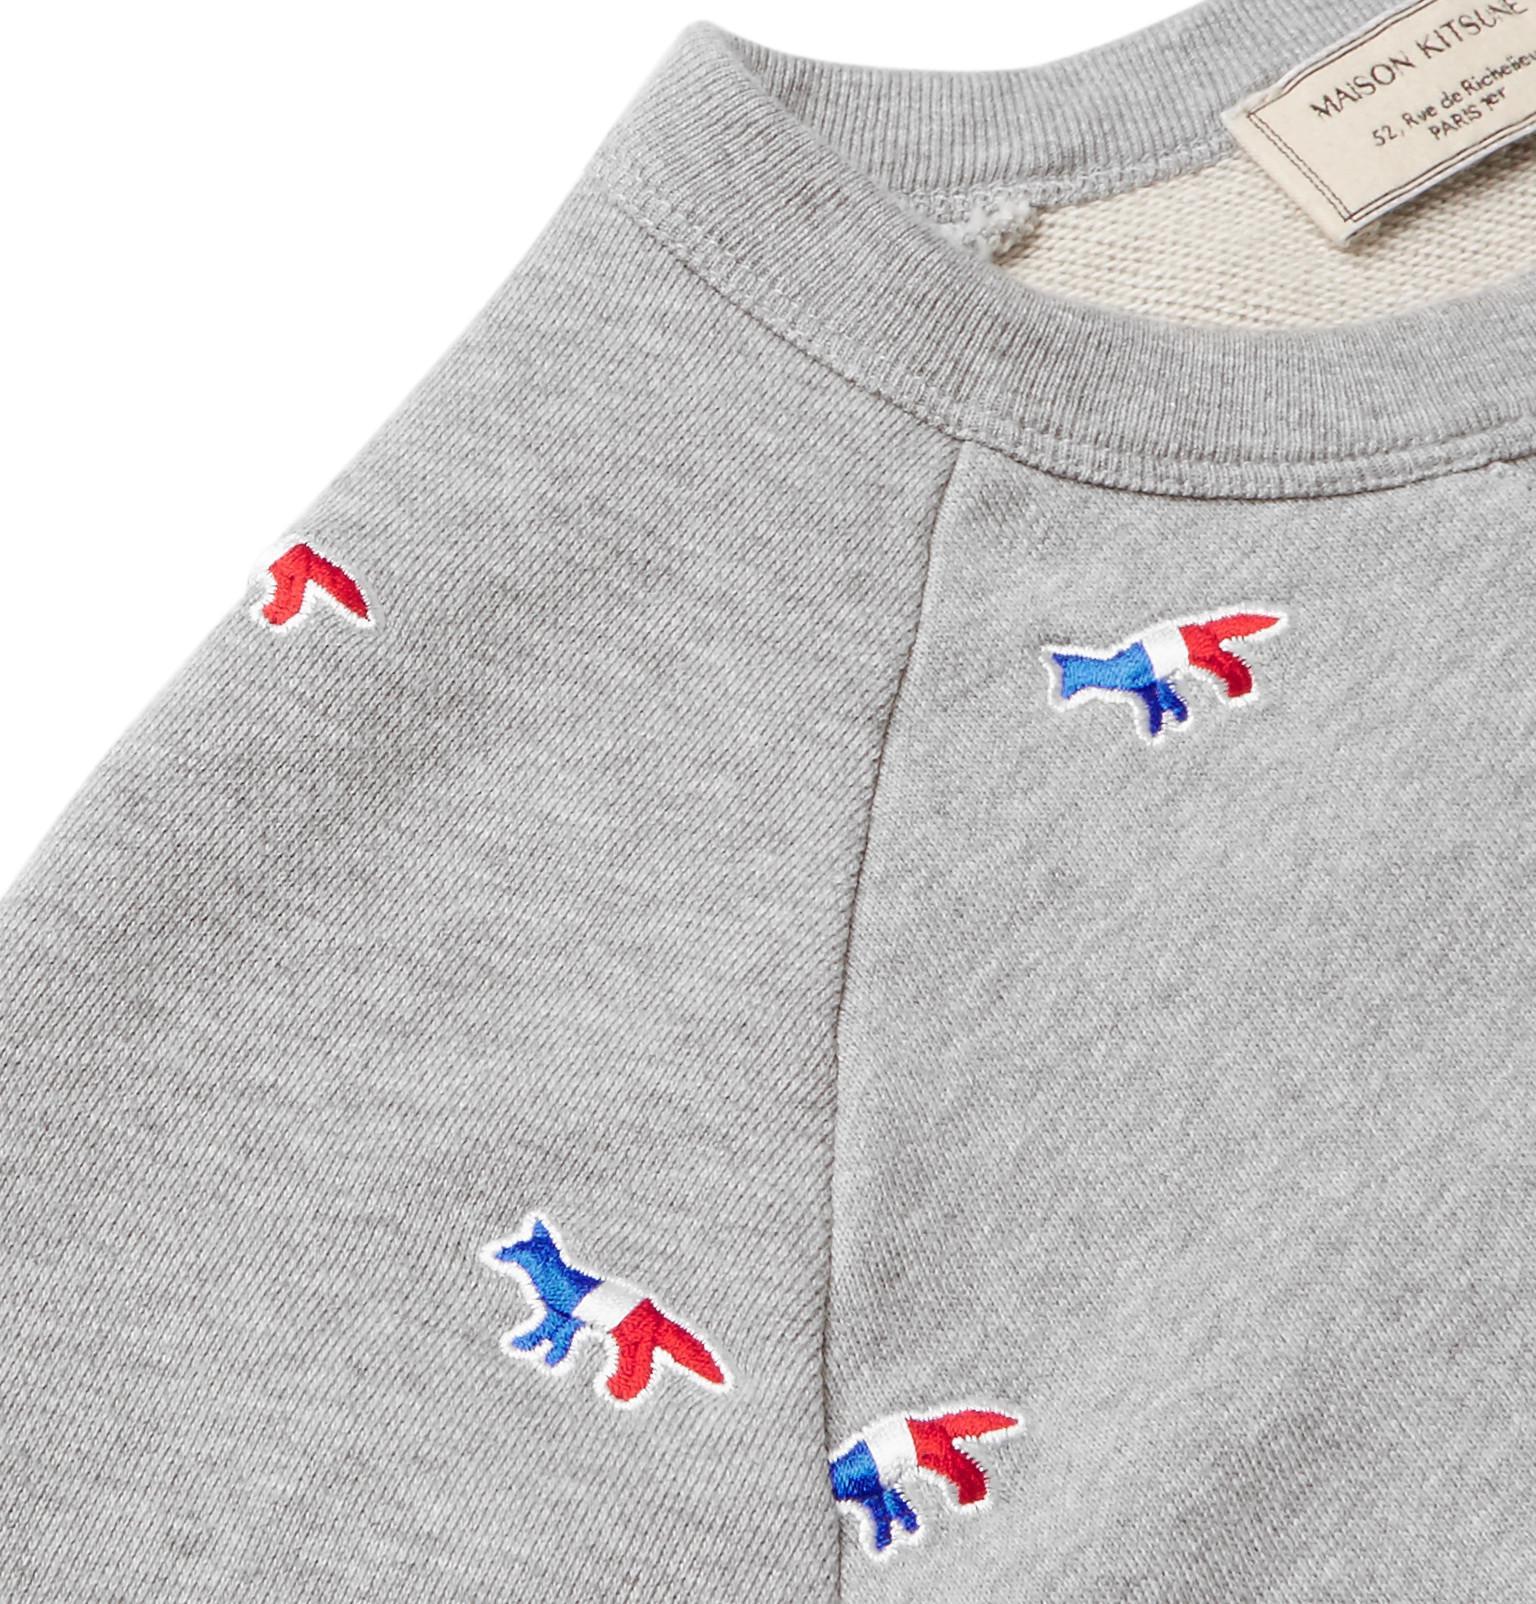 eae5e433e Jersey Gray Loopback Fullscreen Embroidered Men Kitsuné Cotton ...